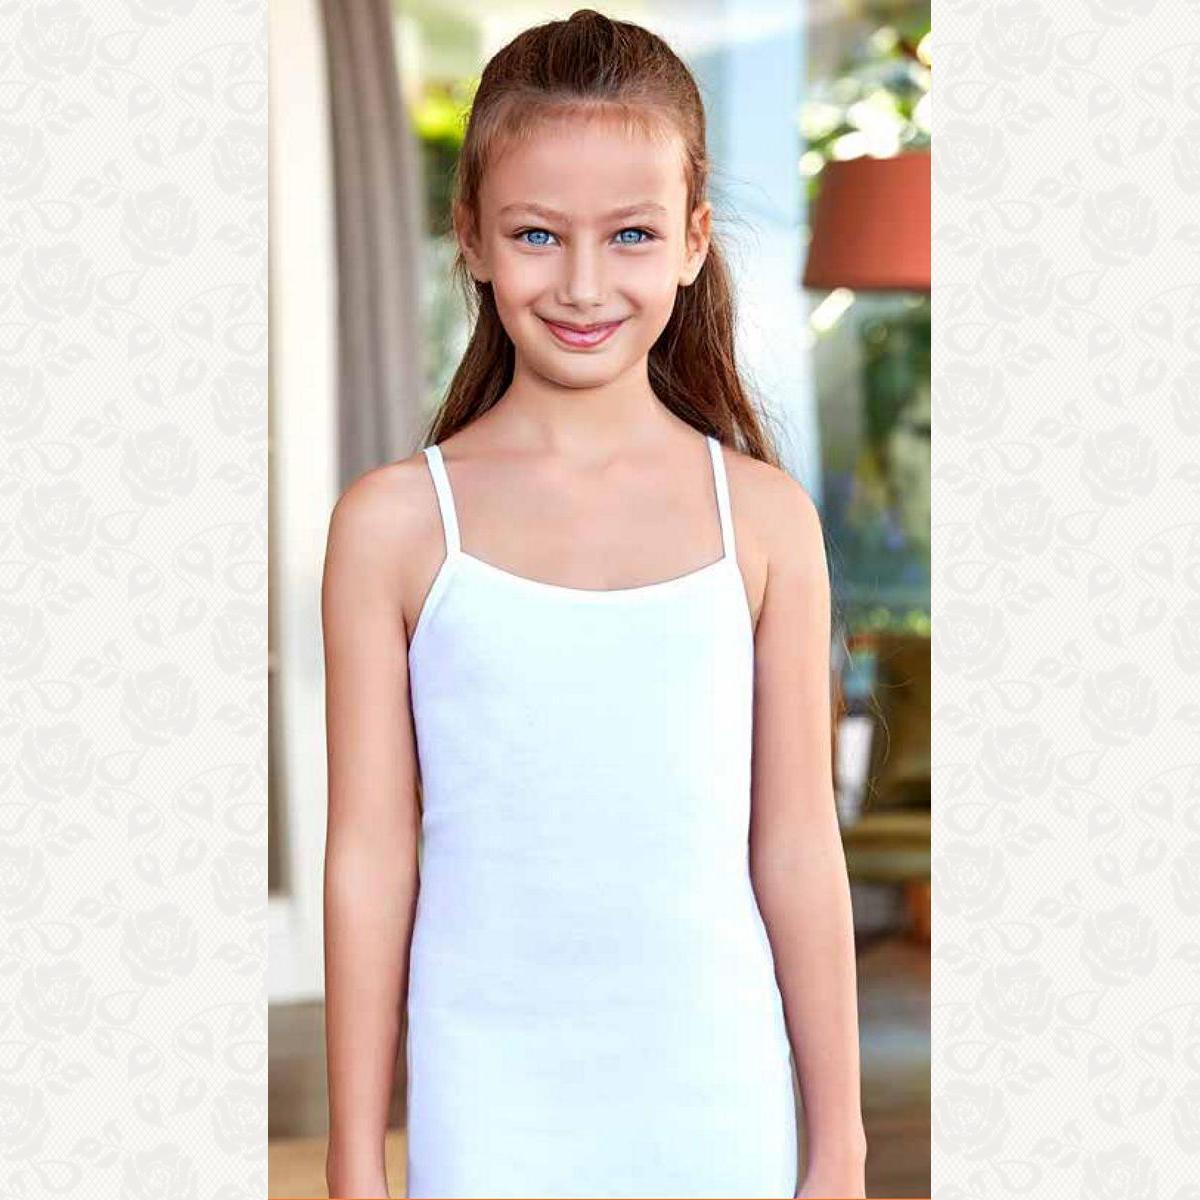 Майка девочка размеры от 4 до 7, цвет белый, 6 шт.